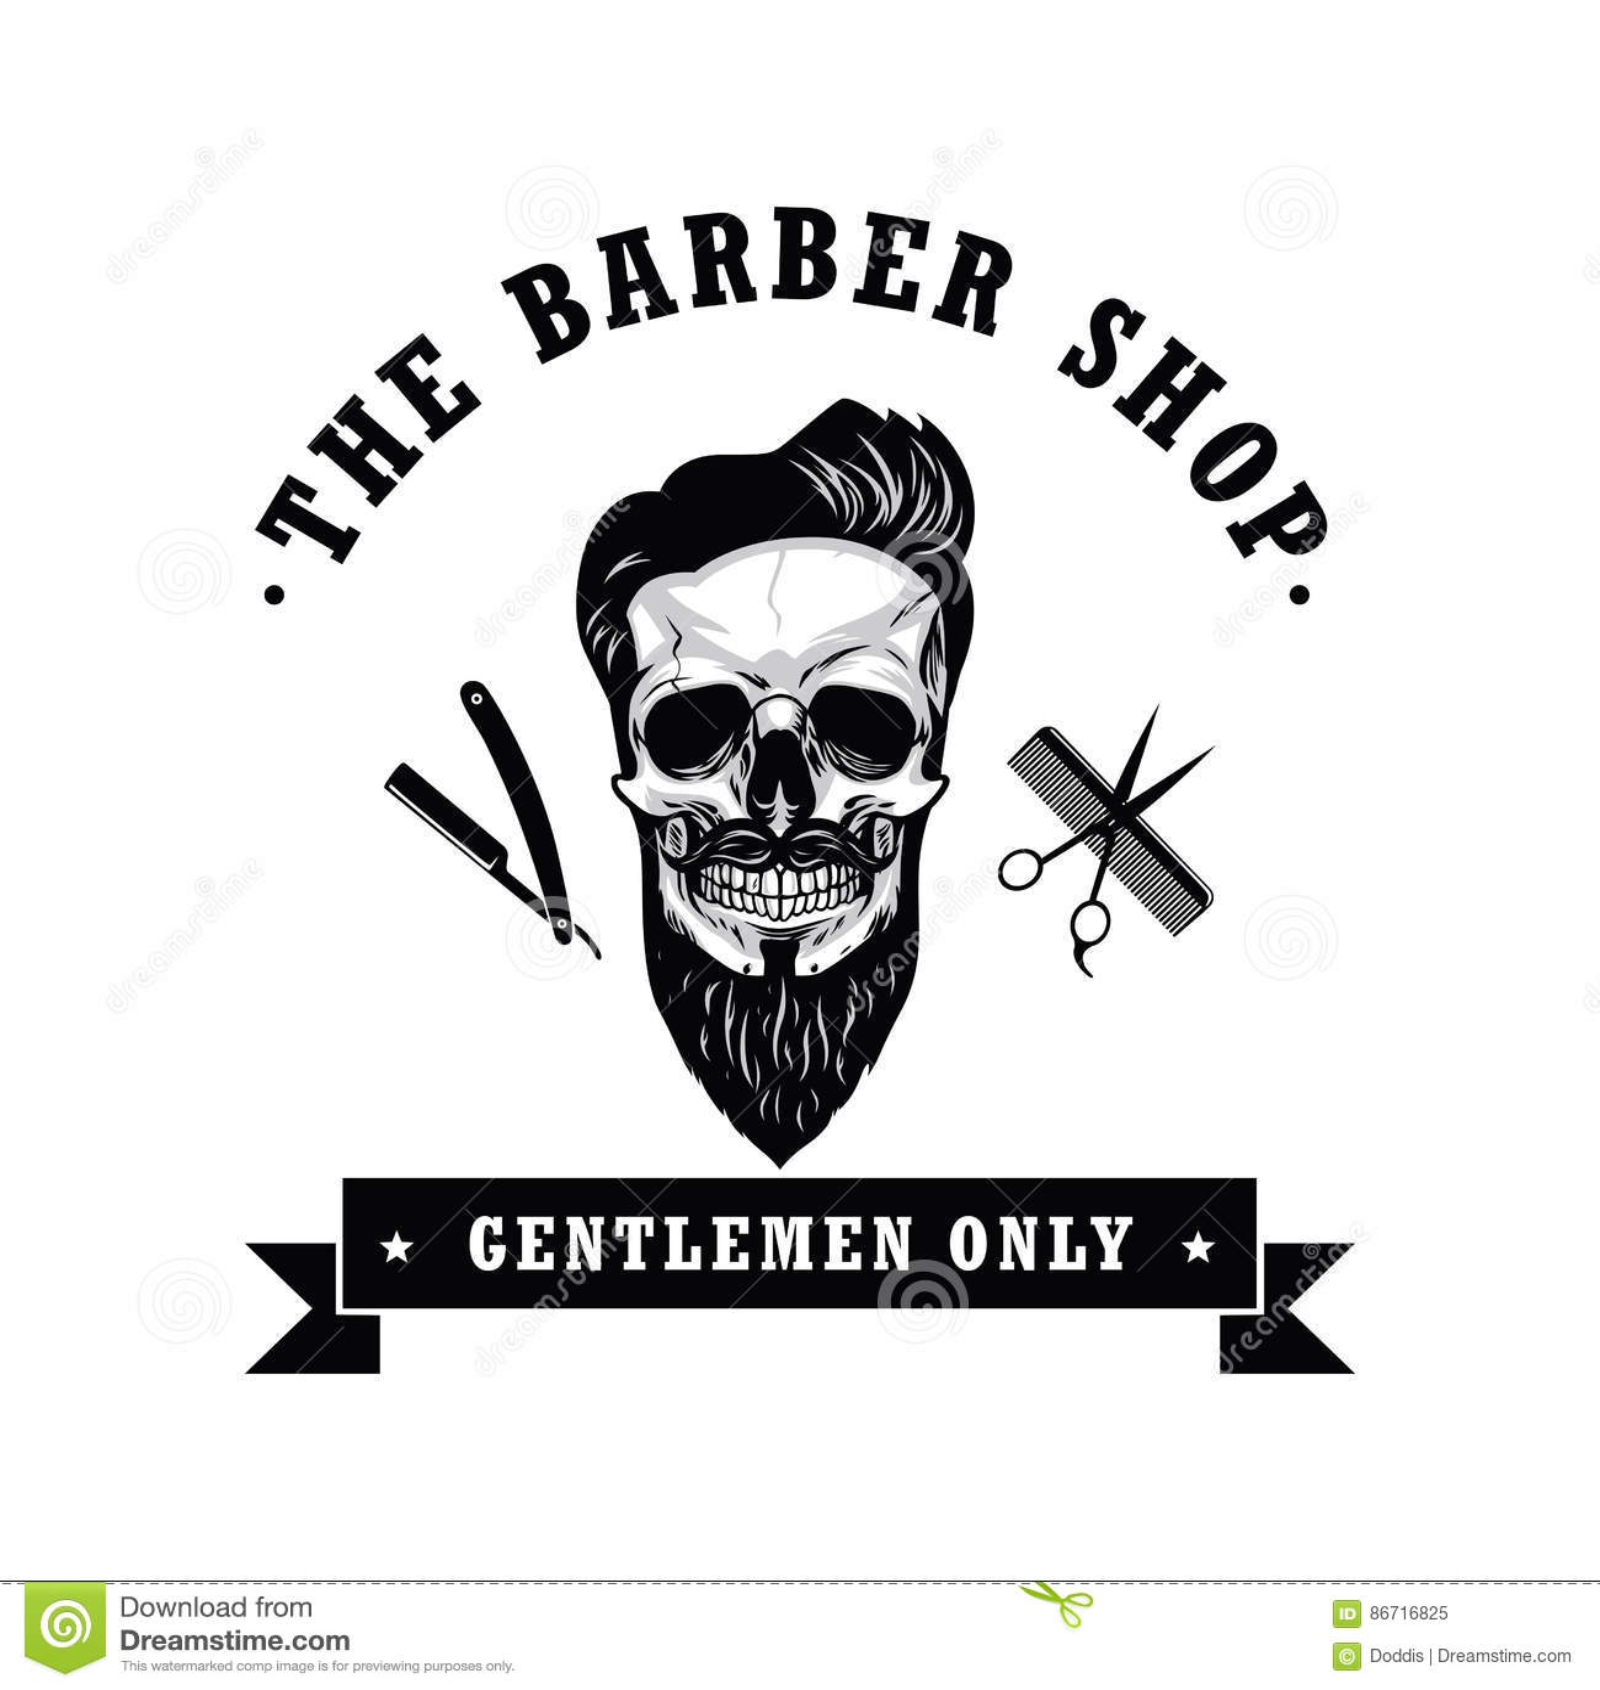 Schadel Weinlese Barber Shop Logo Design Template Vektor